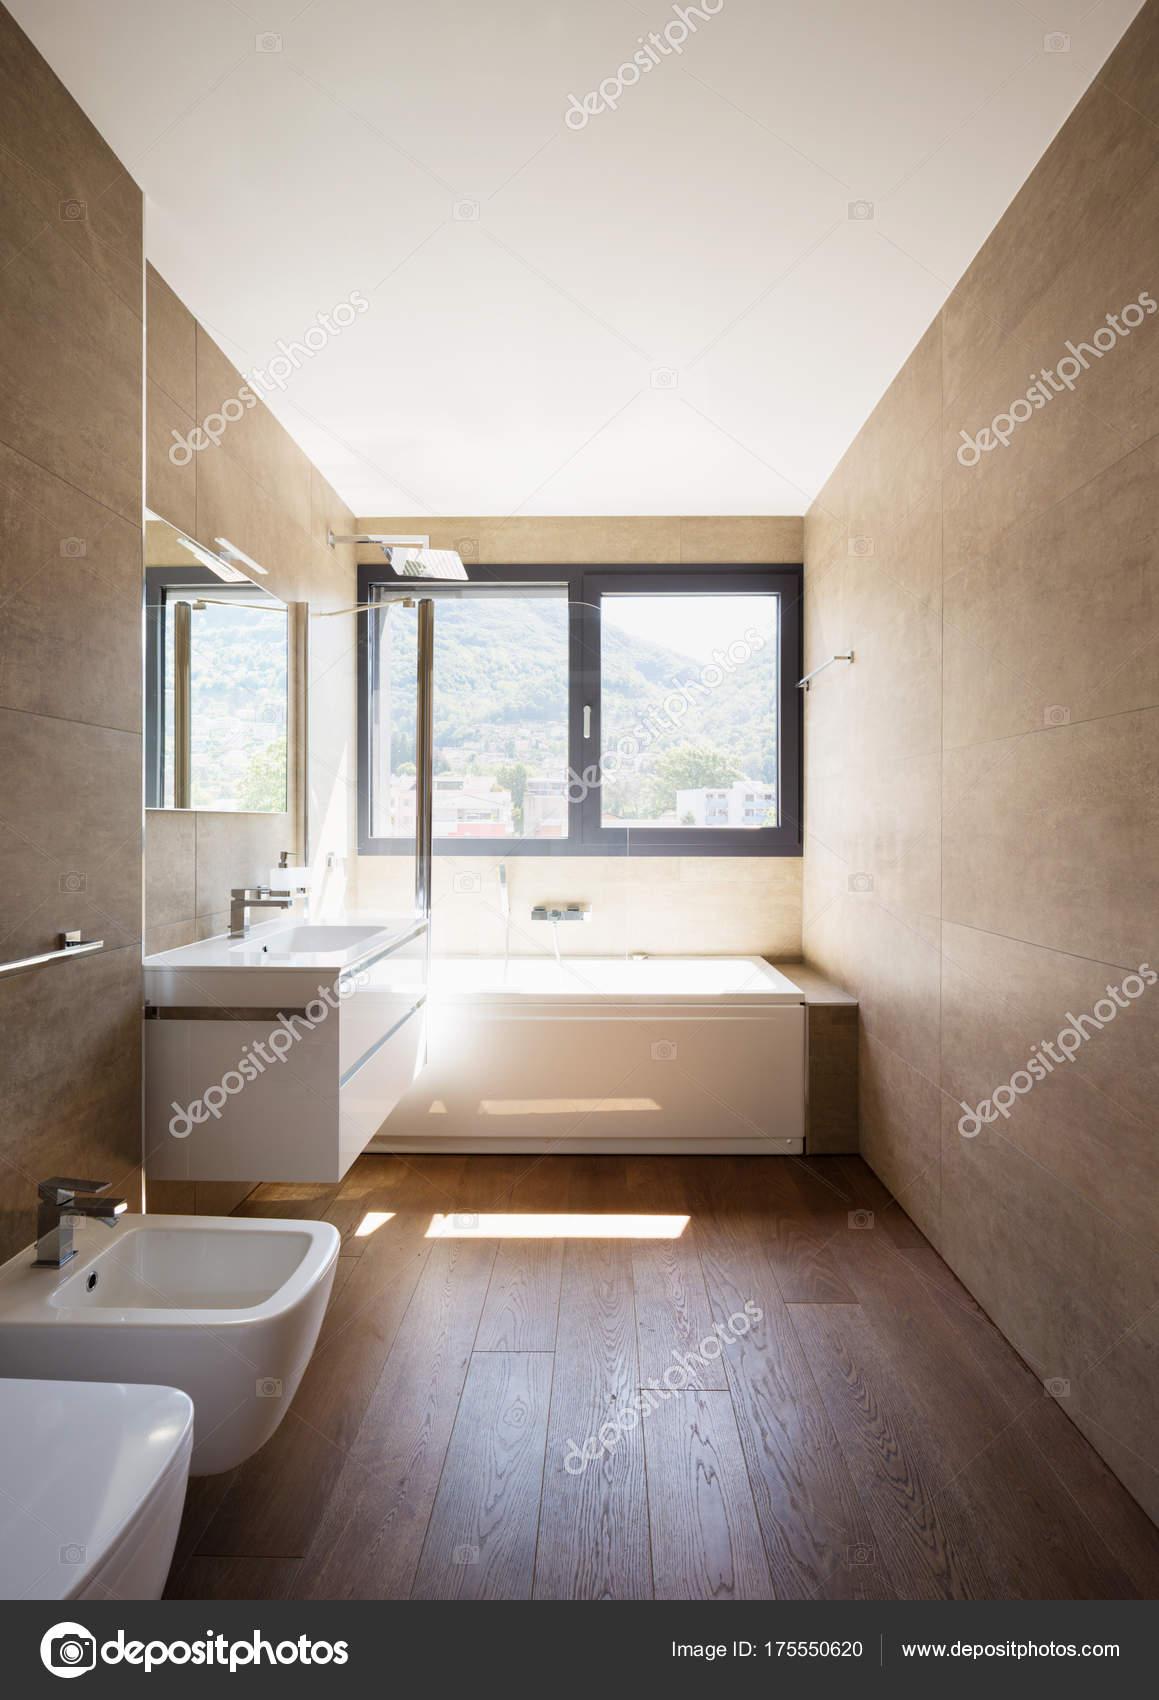 Moderne luxus badezimmer  moderne luxus-badezimmer — Stockfoto © Zveiger #175550620